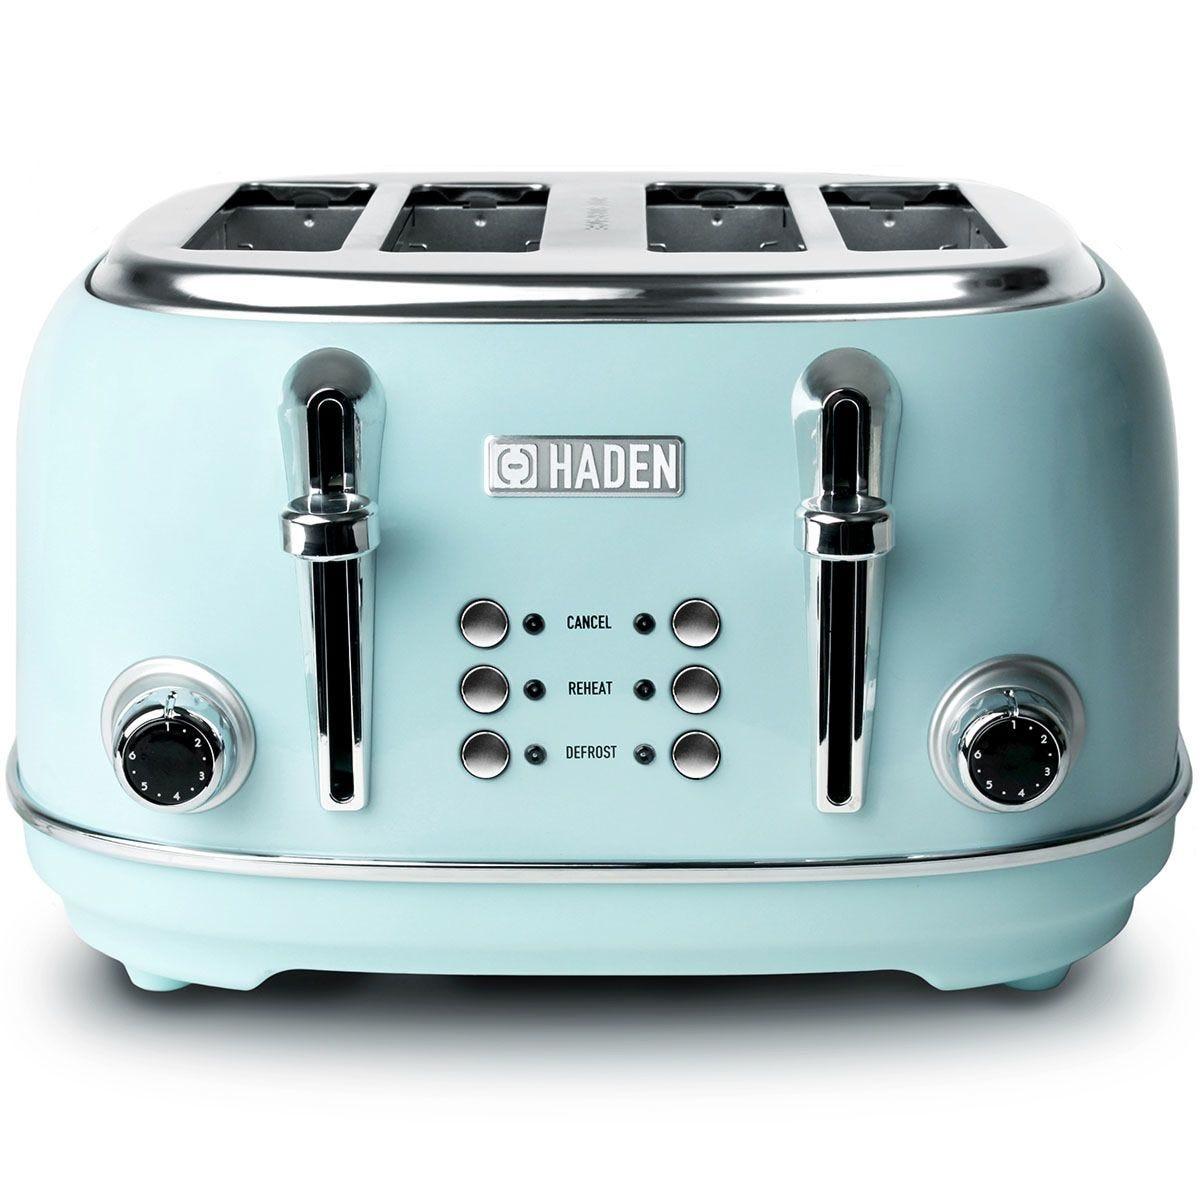 Haden 194244 Heritage 1630W  4–Slice Toaster – Turquoise